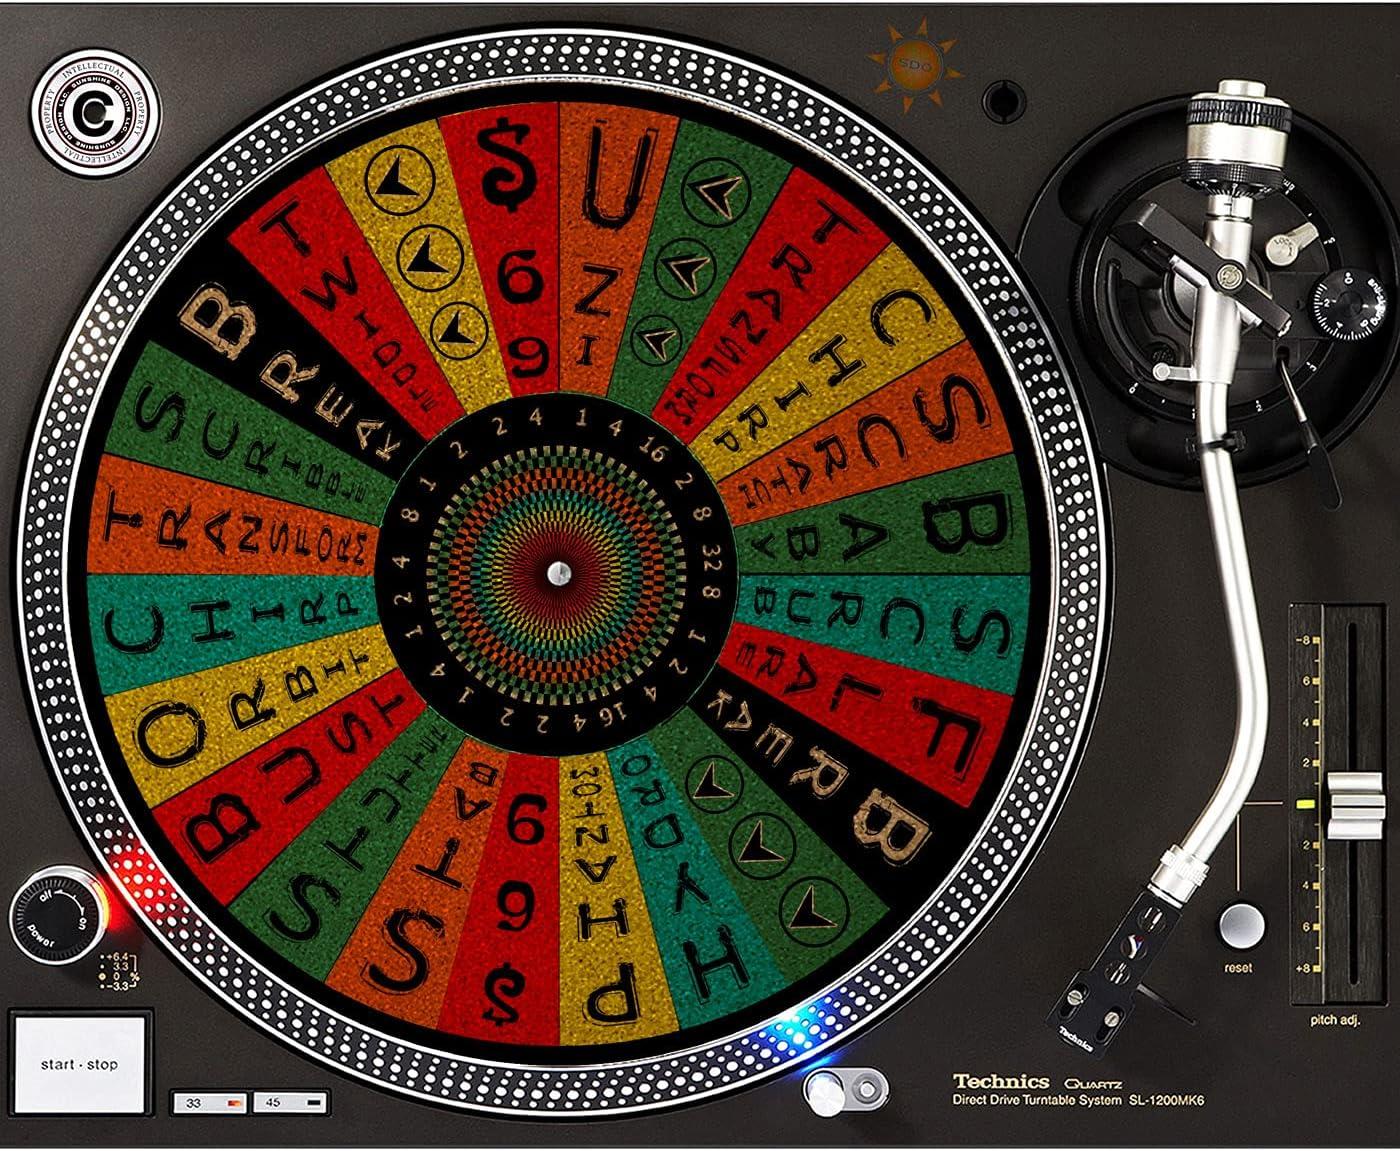 DJ Turntable Premium Cork Slipmat Wheel Fresno Mall The Scratch Max 62% OFF Spin -